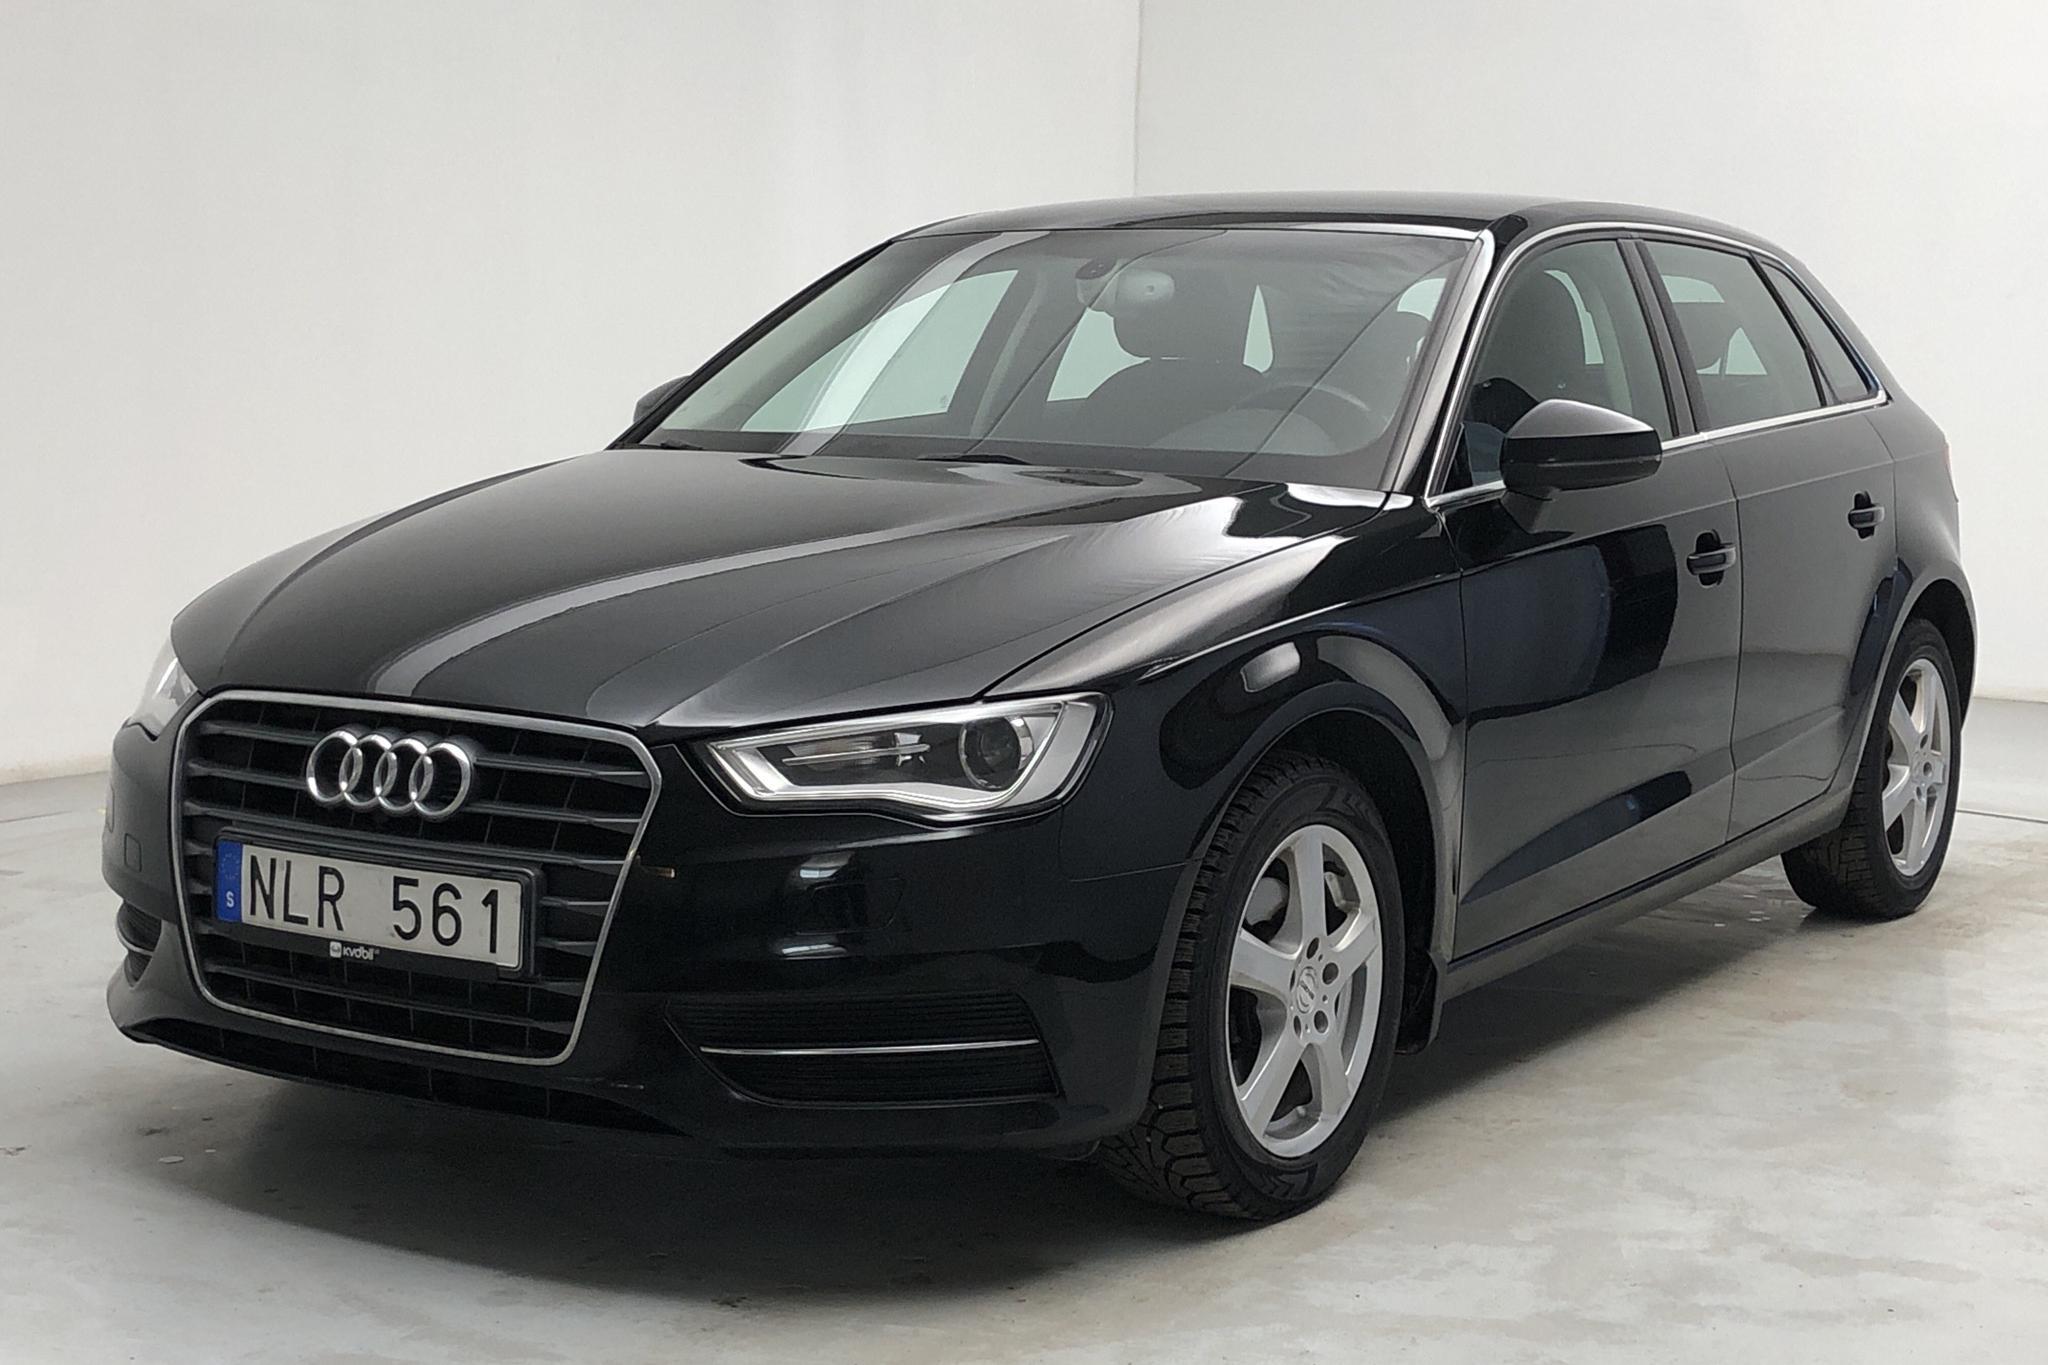 Audi A3 1.6 TDI Sportback (105hk) - 14 983 mil - Automat - svart - 2014